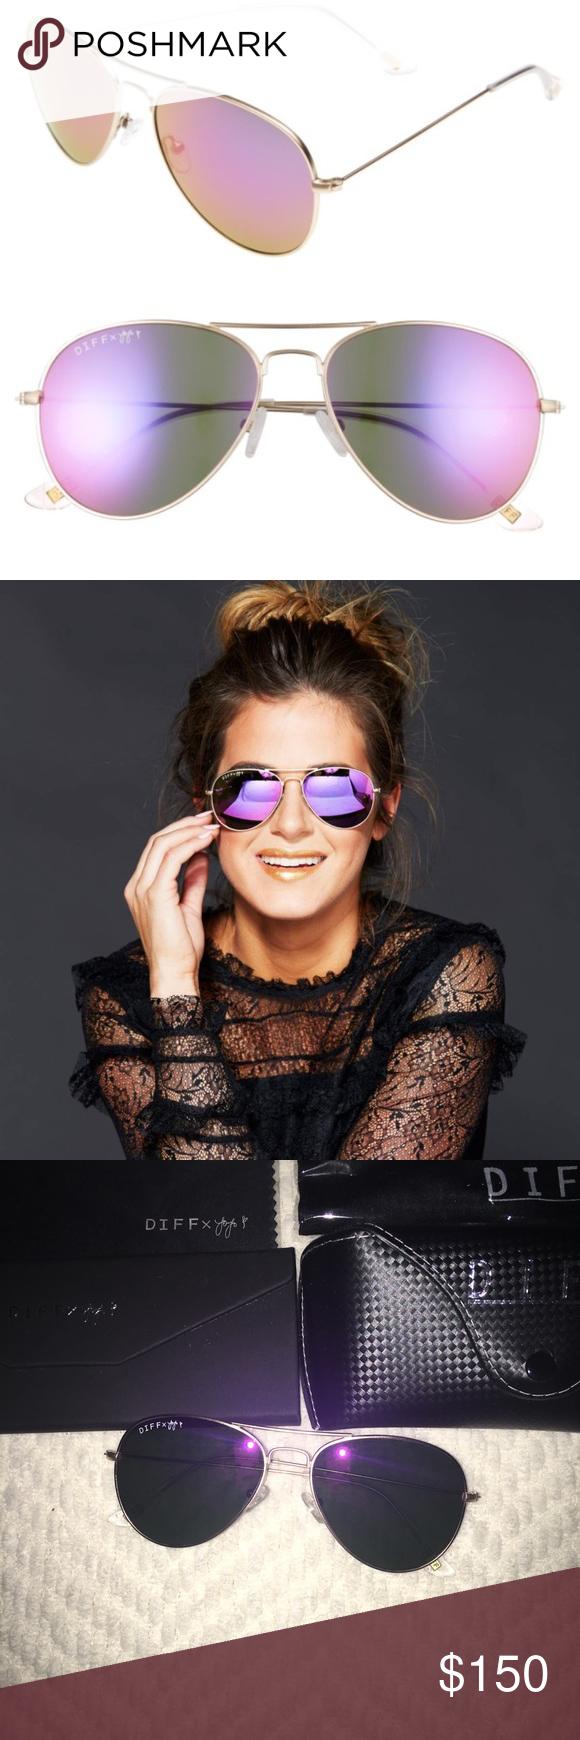 f1c3b45a32e56 DIFF x JoJo eyewear purple sunglasses ✨New✨ (no tags  never had any) DIFF  eyewear in collaboration with JoJo (was The Bachelorette) purple aviator ...